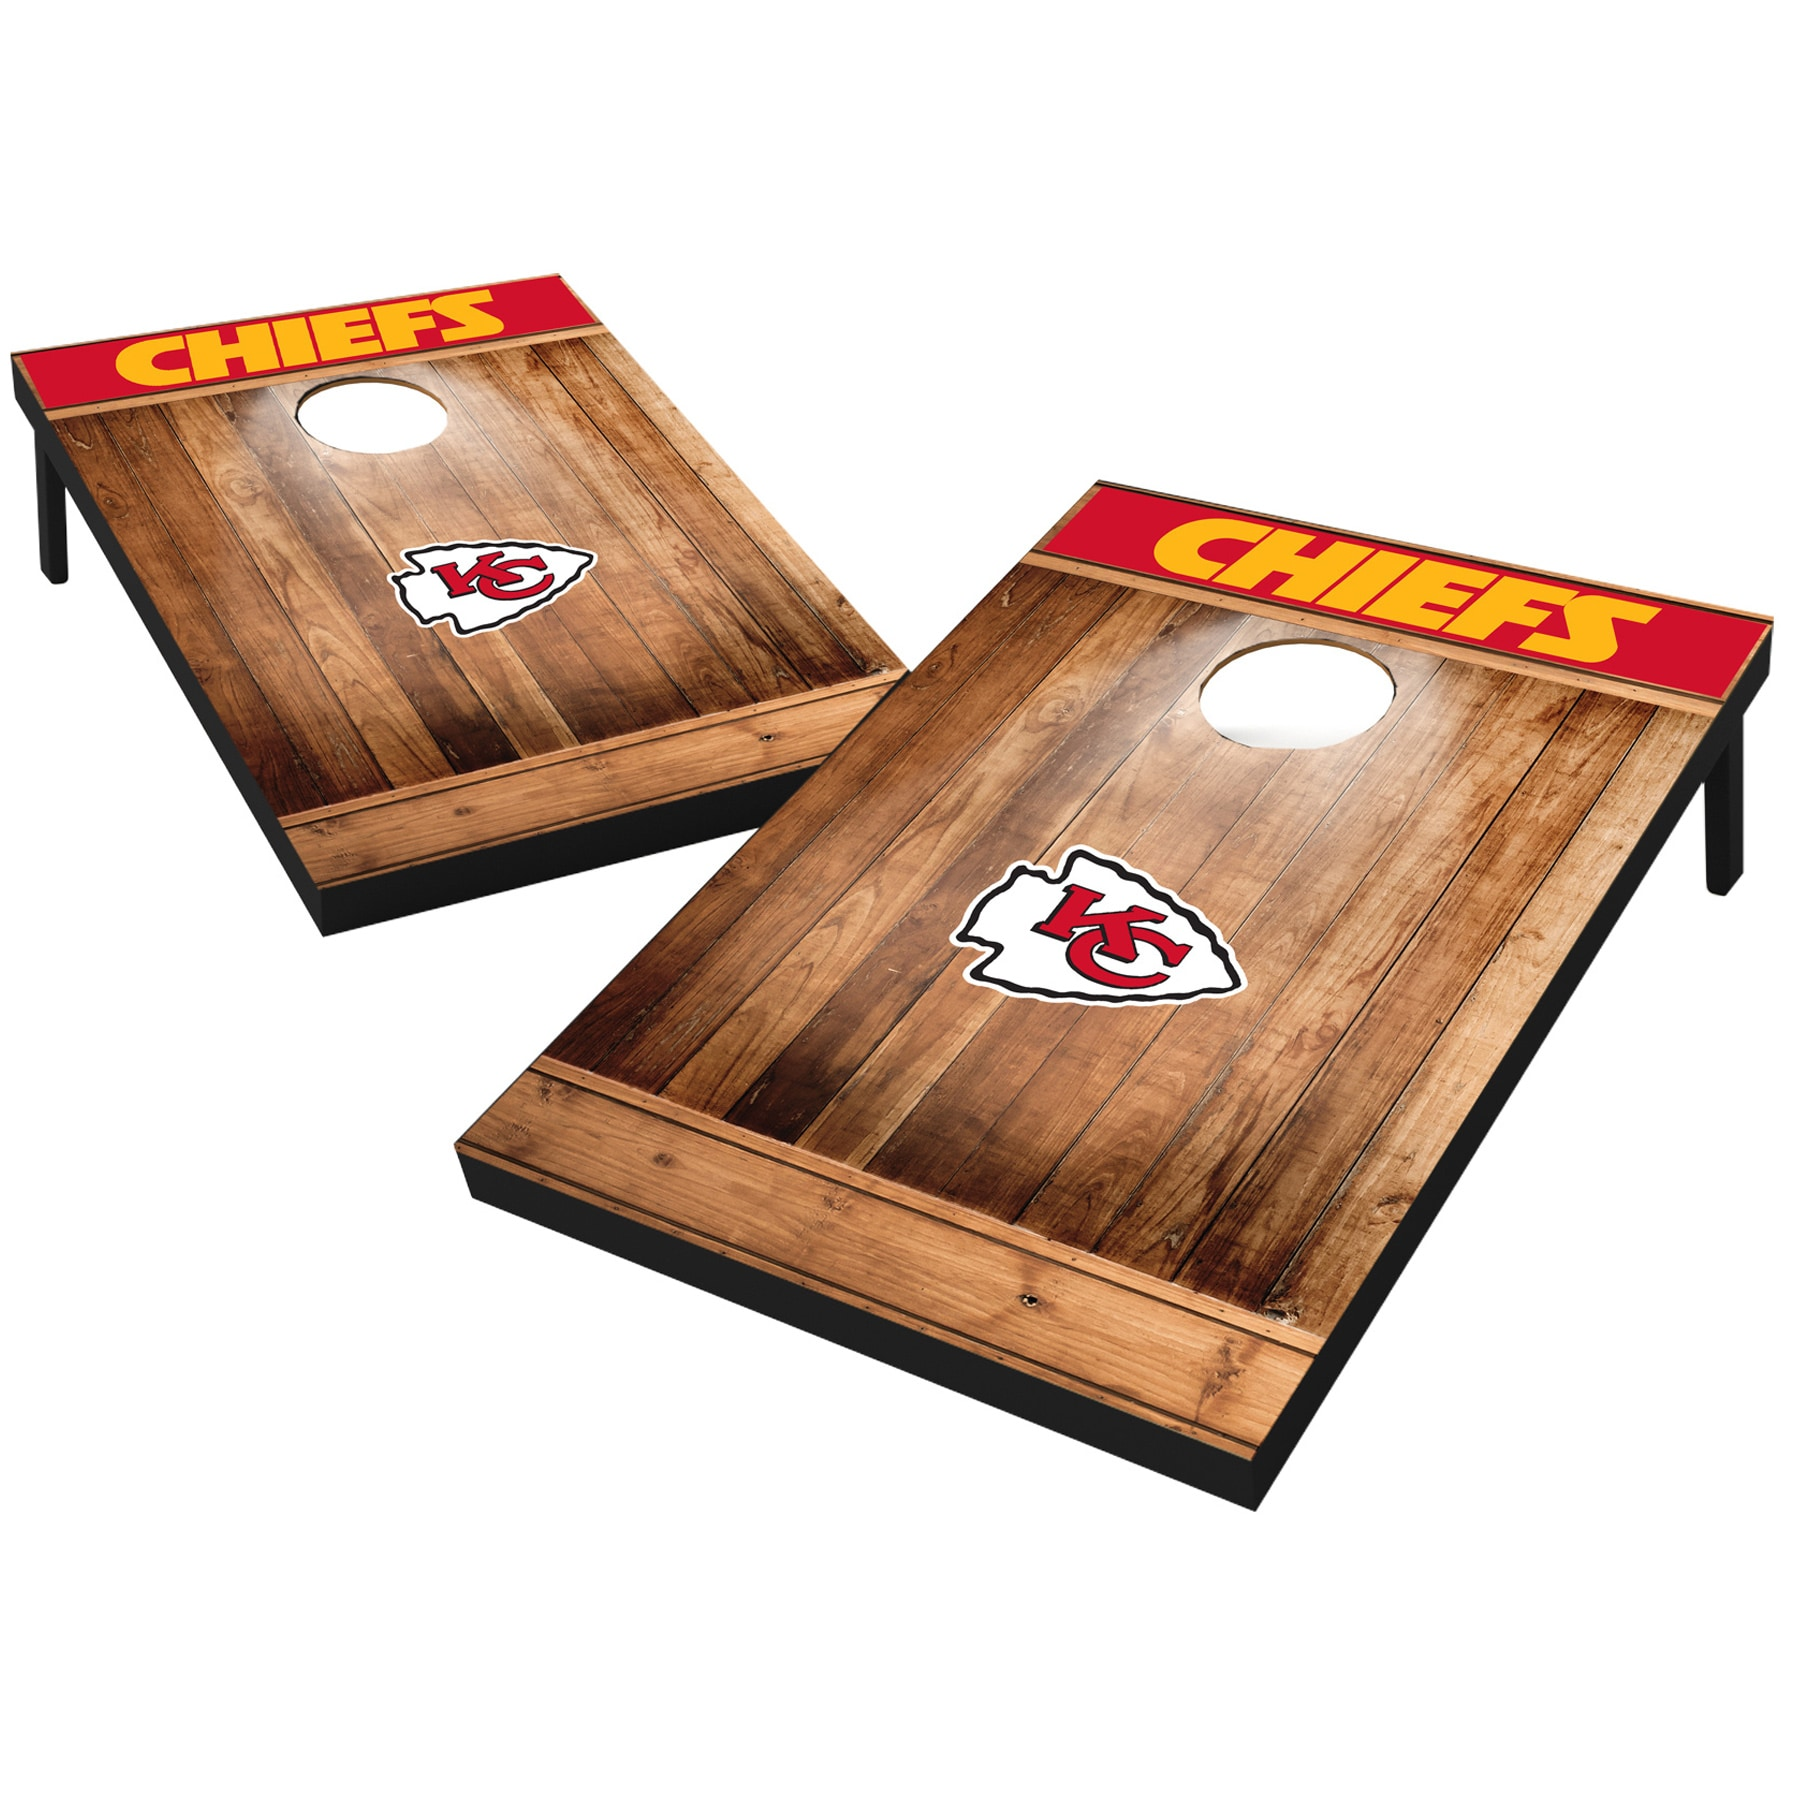 Kansas City Chiefs 2' x 3' Wood Design Cornhole Board Tailgate Toss Set